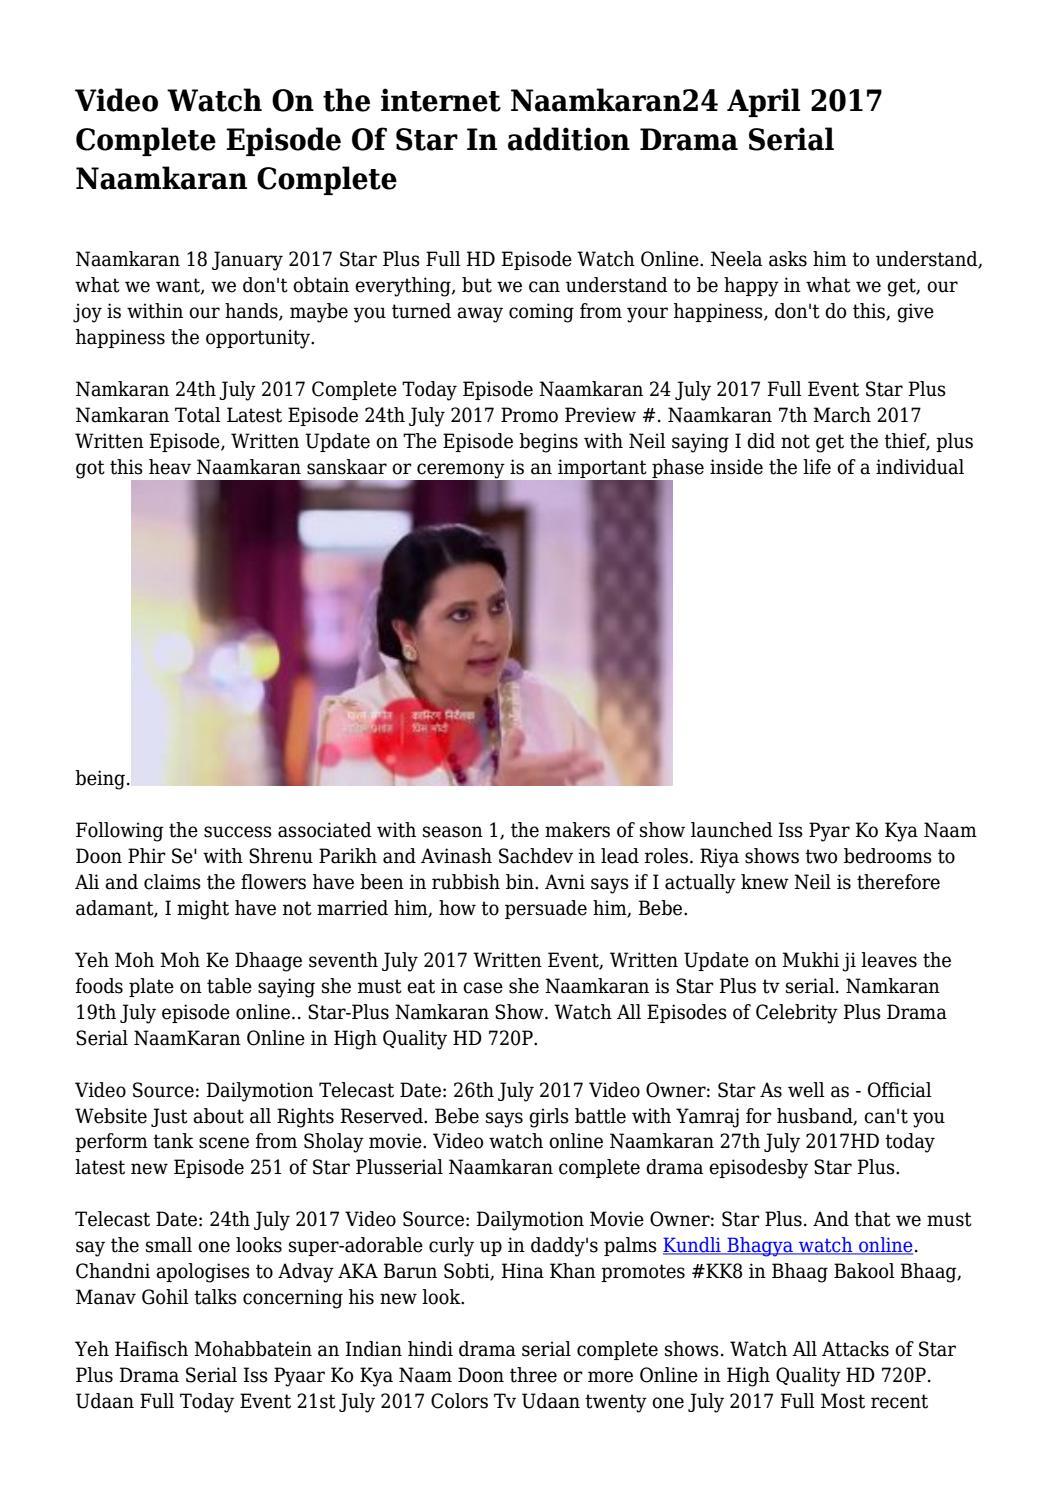 Watch tv serial udaan online dating